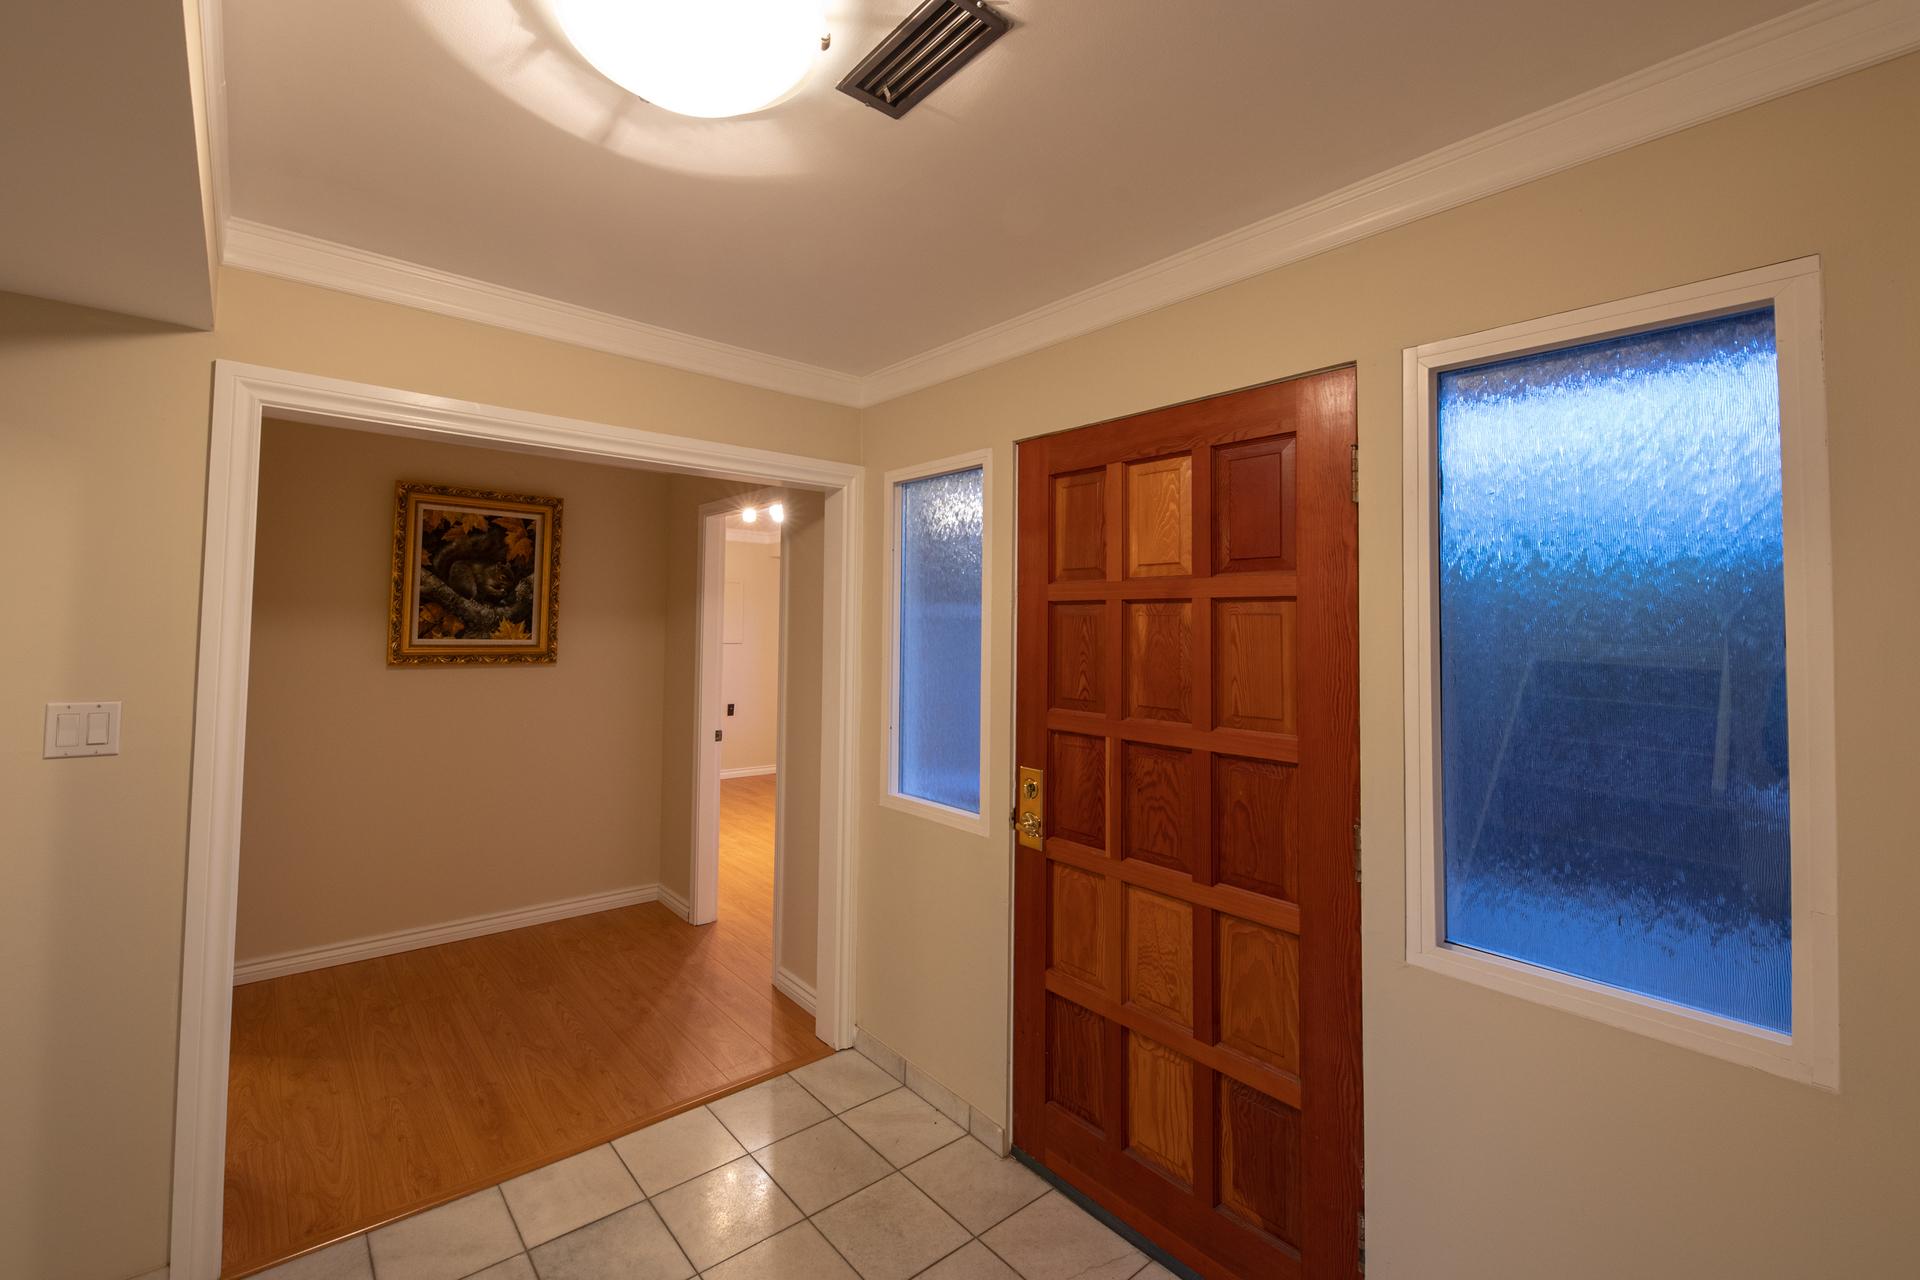 interior_004 at 997 Cross Creek Road, British Properties, West Vancouver